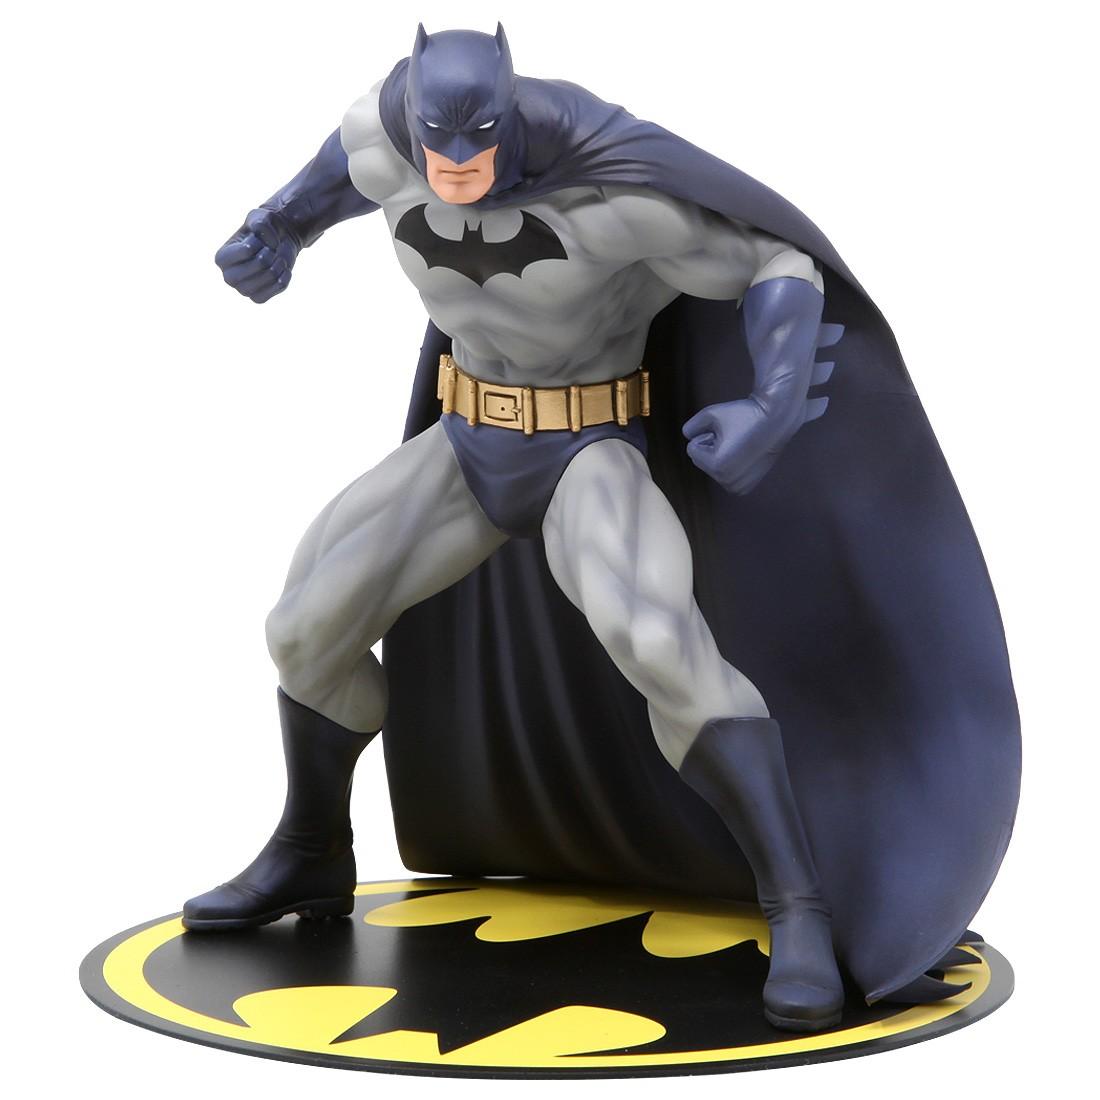 Kotobukiya Artfx Dc Comic Batman Hush Statue Gray